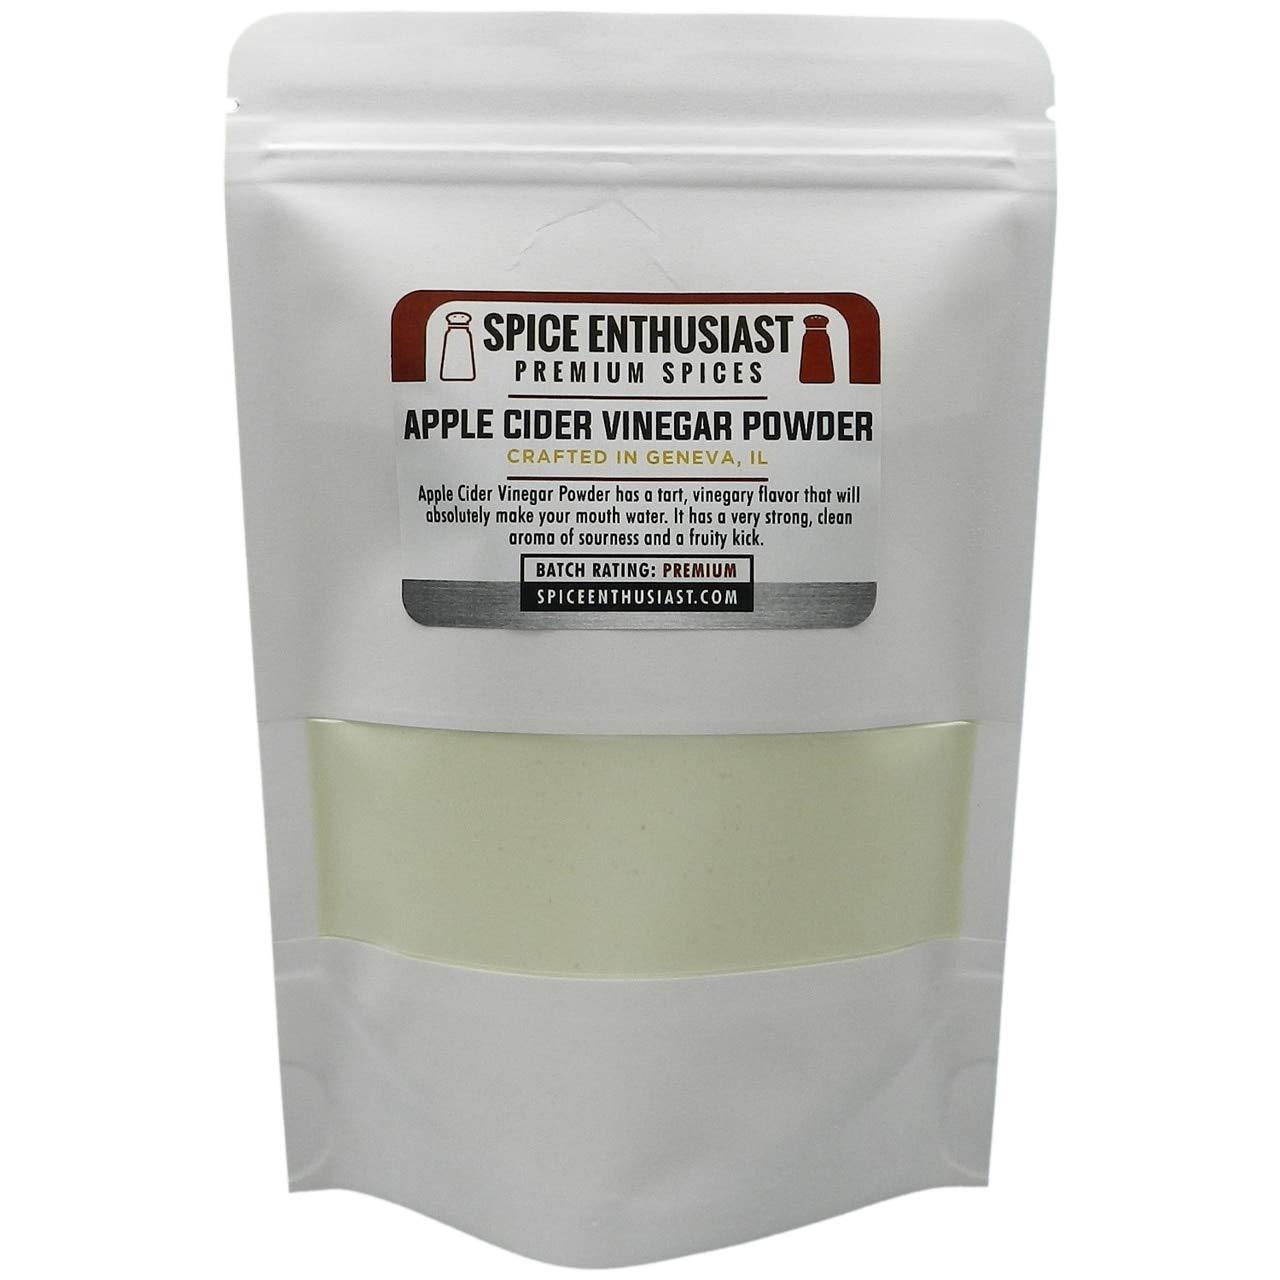 Spice Enthusiast Apple Cider Vinegar Powder - 4 oz